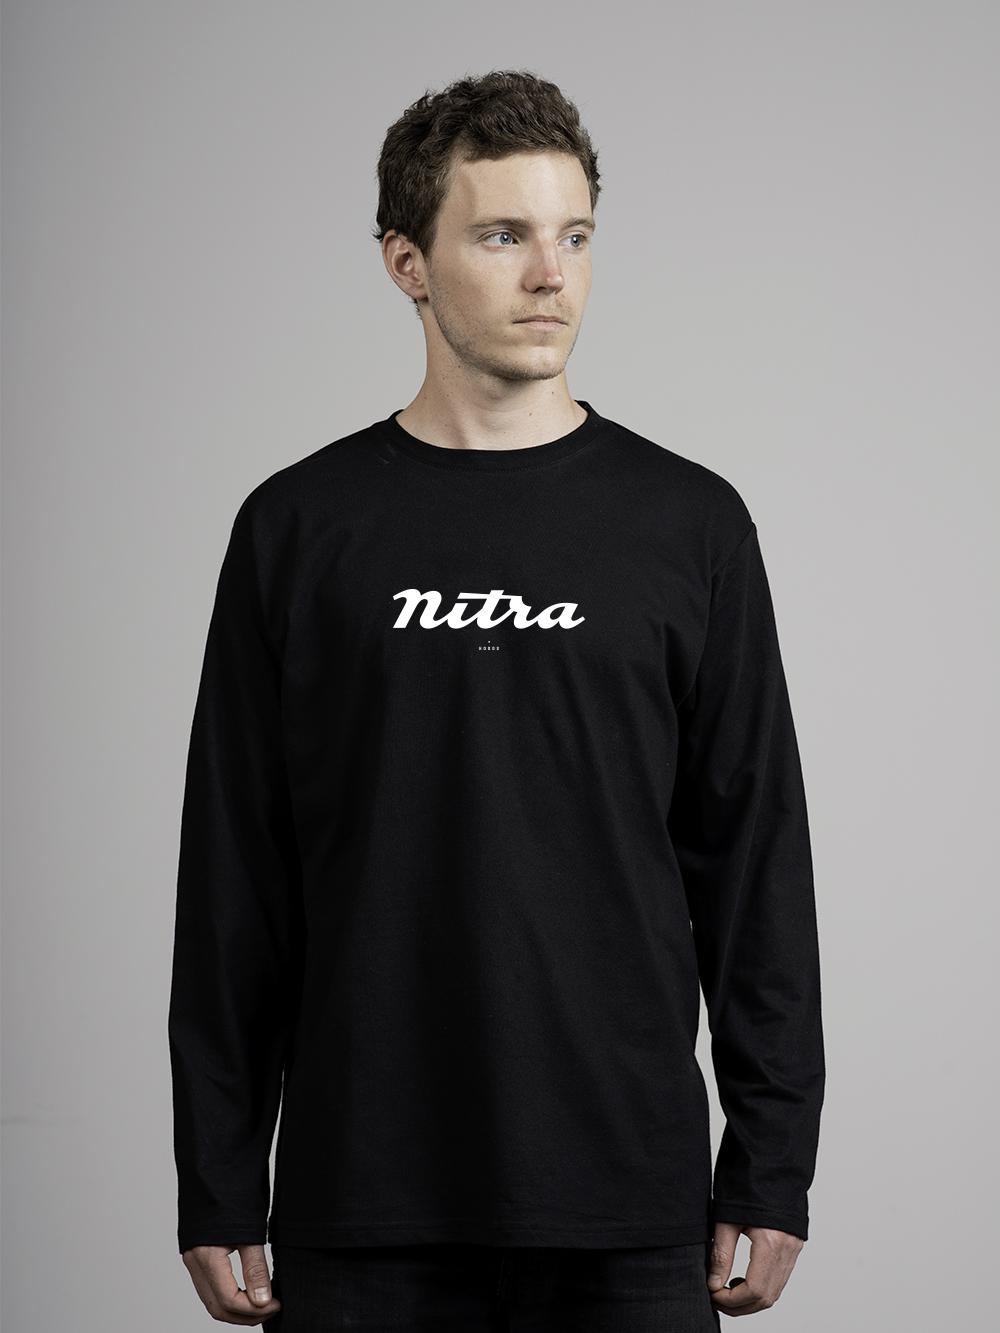 Nitra Big